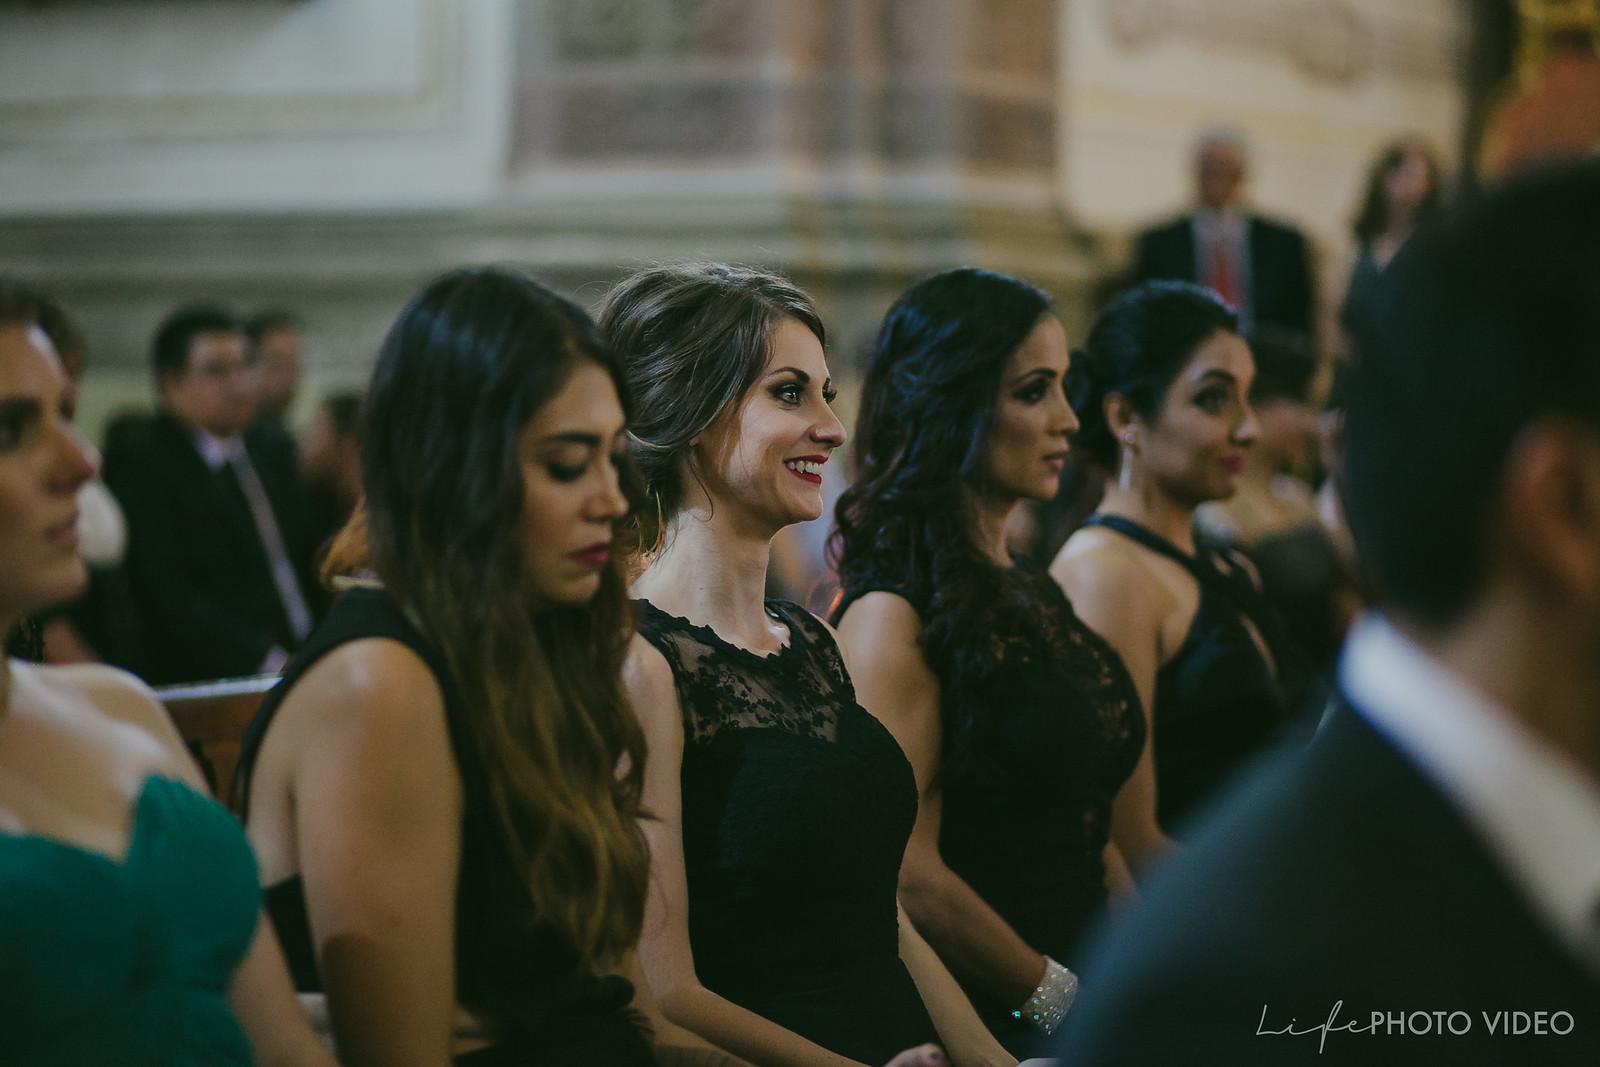 LifePhotoVideo_Boda_Guanajuato_Wedding_0038